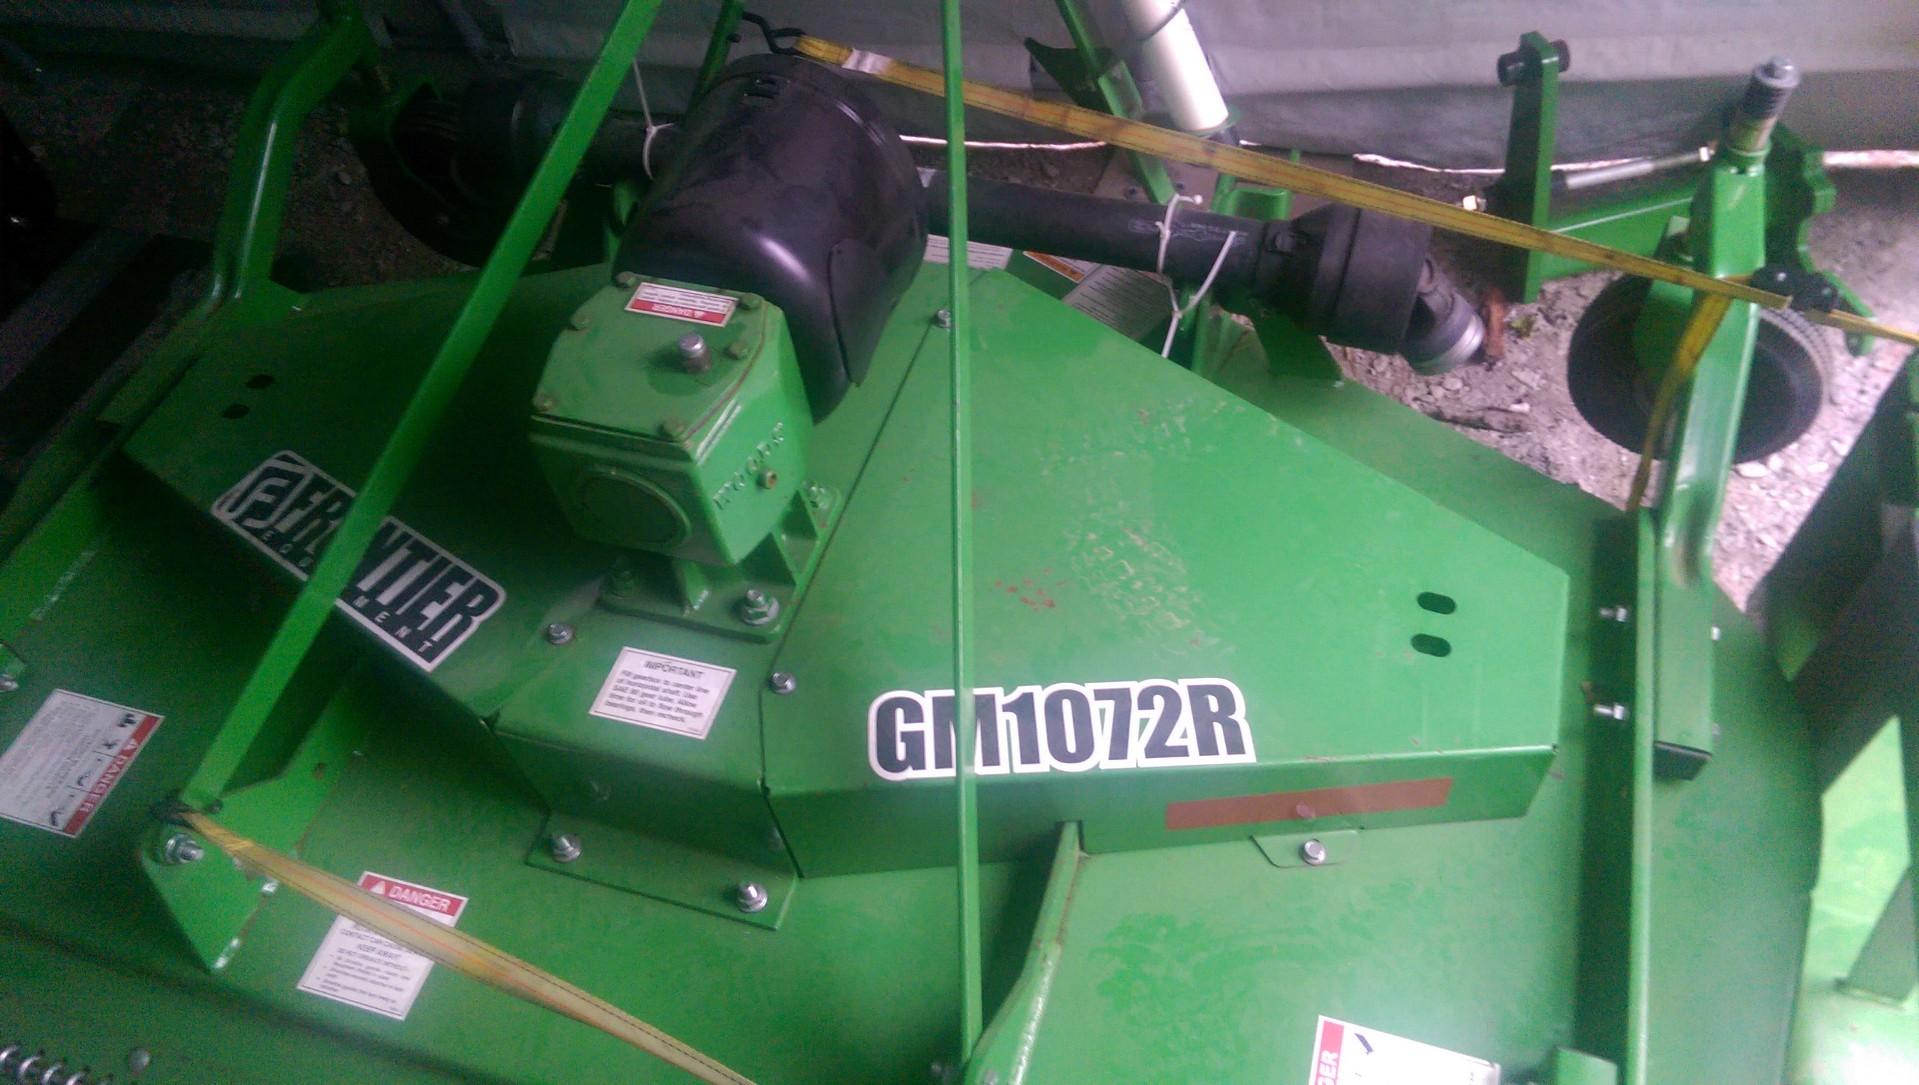 Brand new Frontier GM1072R finish mower